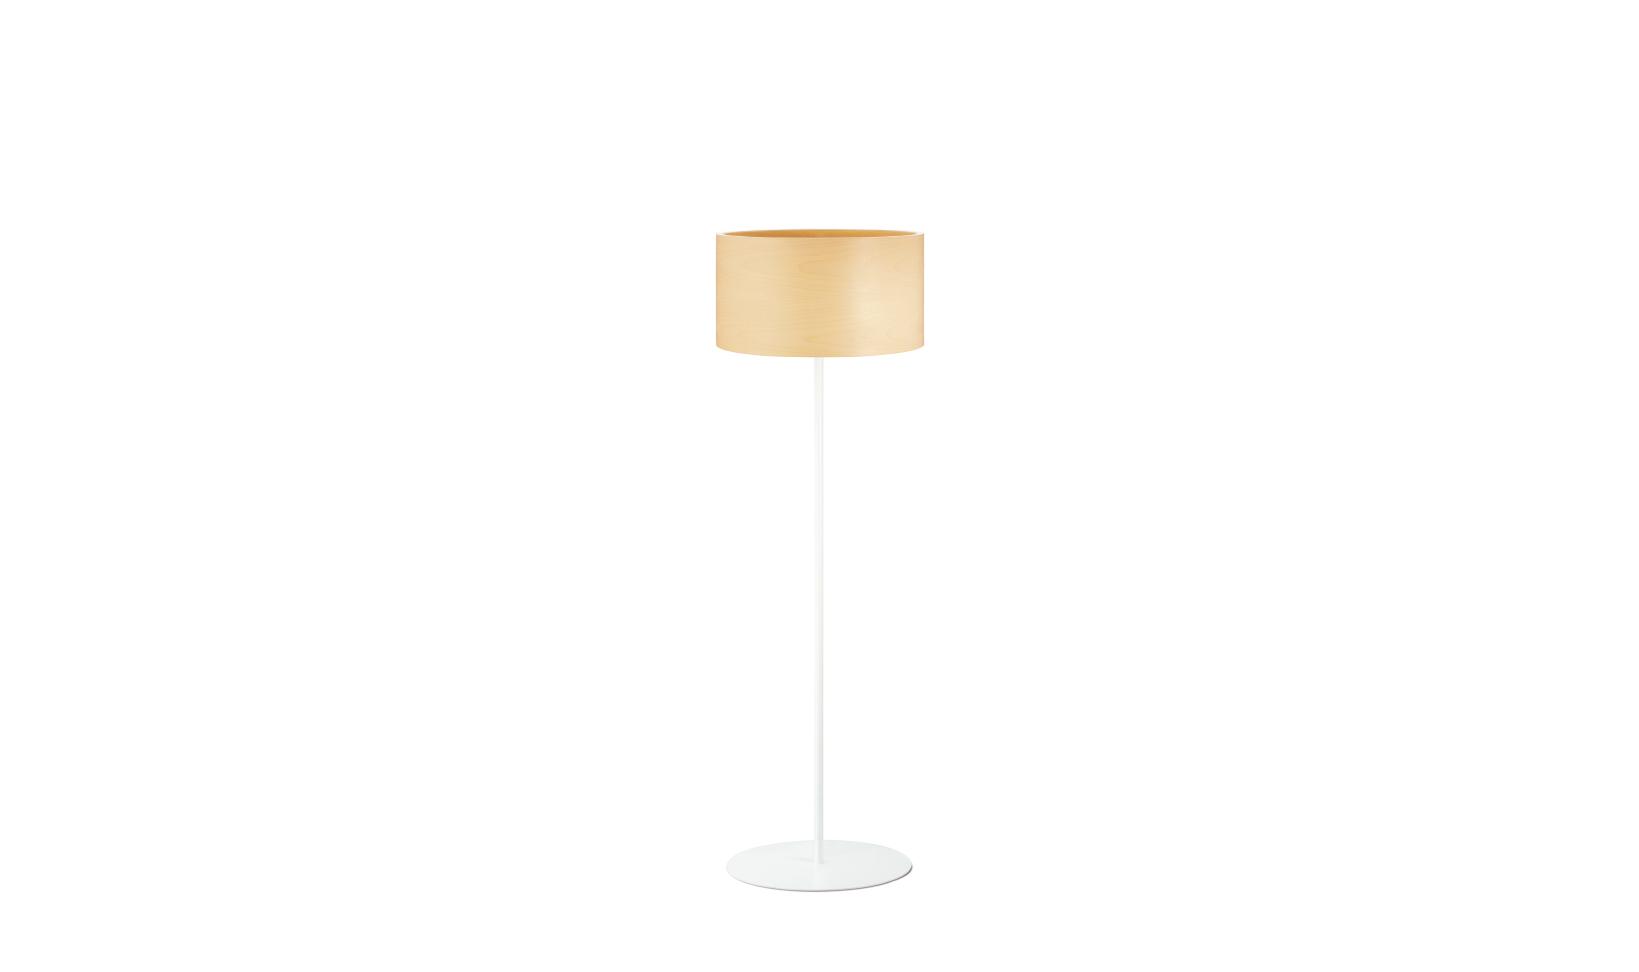 dreizehngrad floor lamp model Funk 40/22S maple veneer lamp design lamp